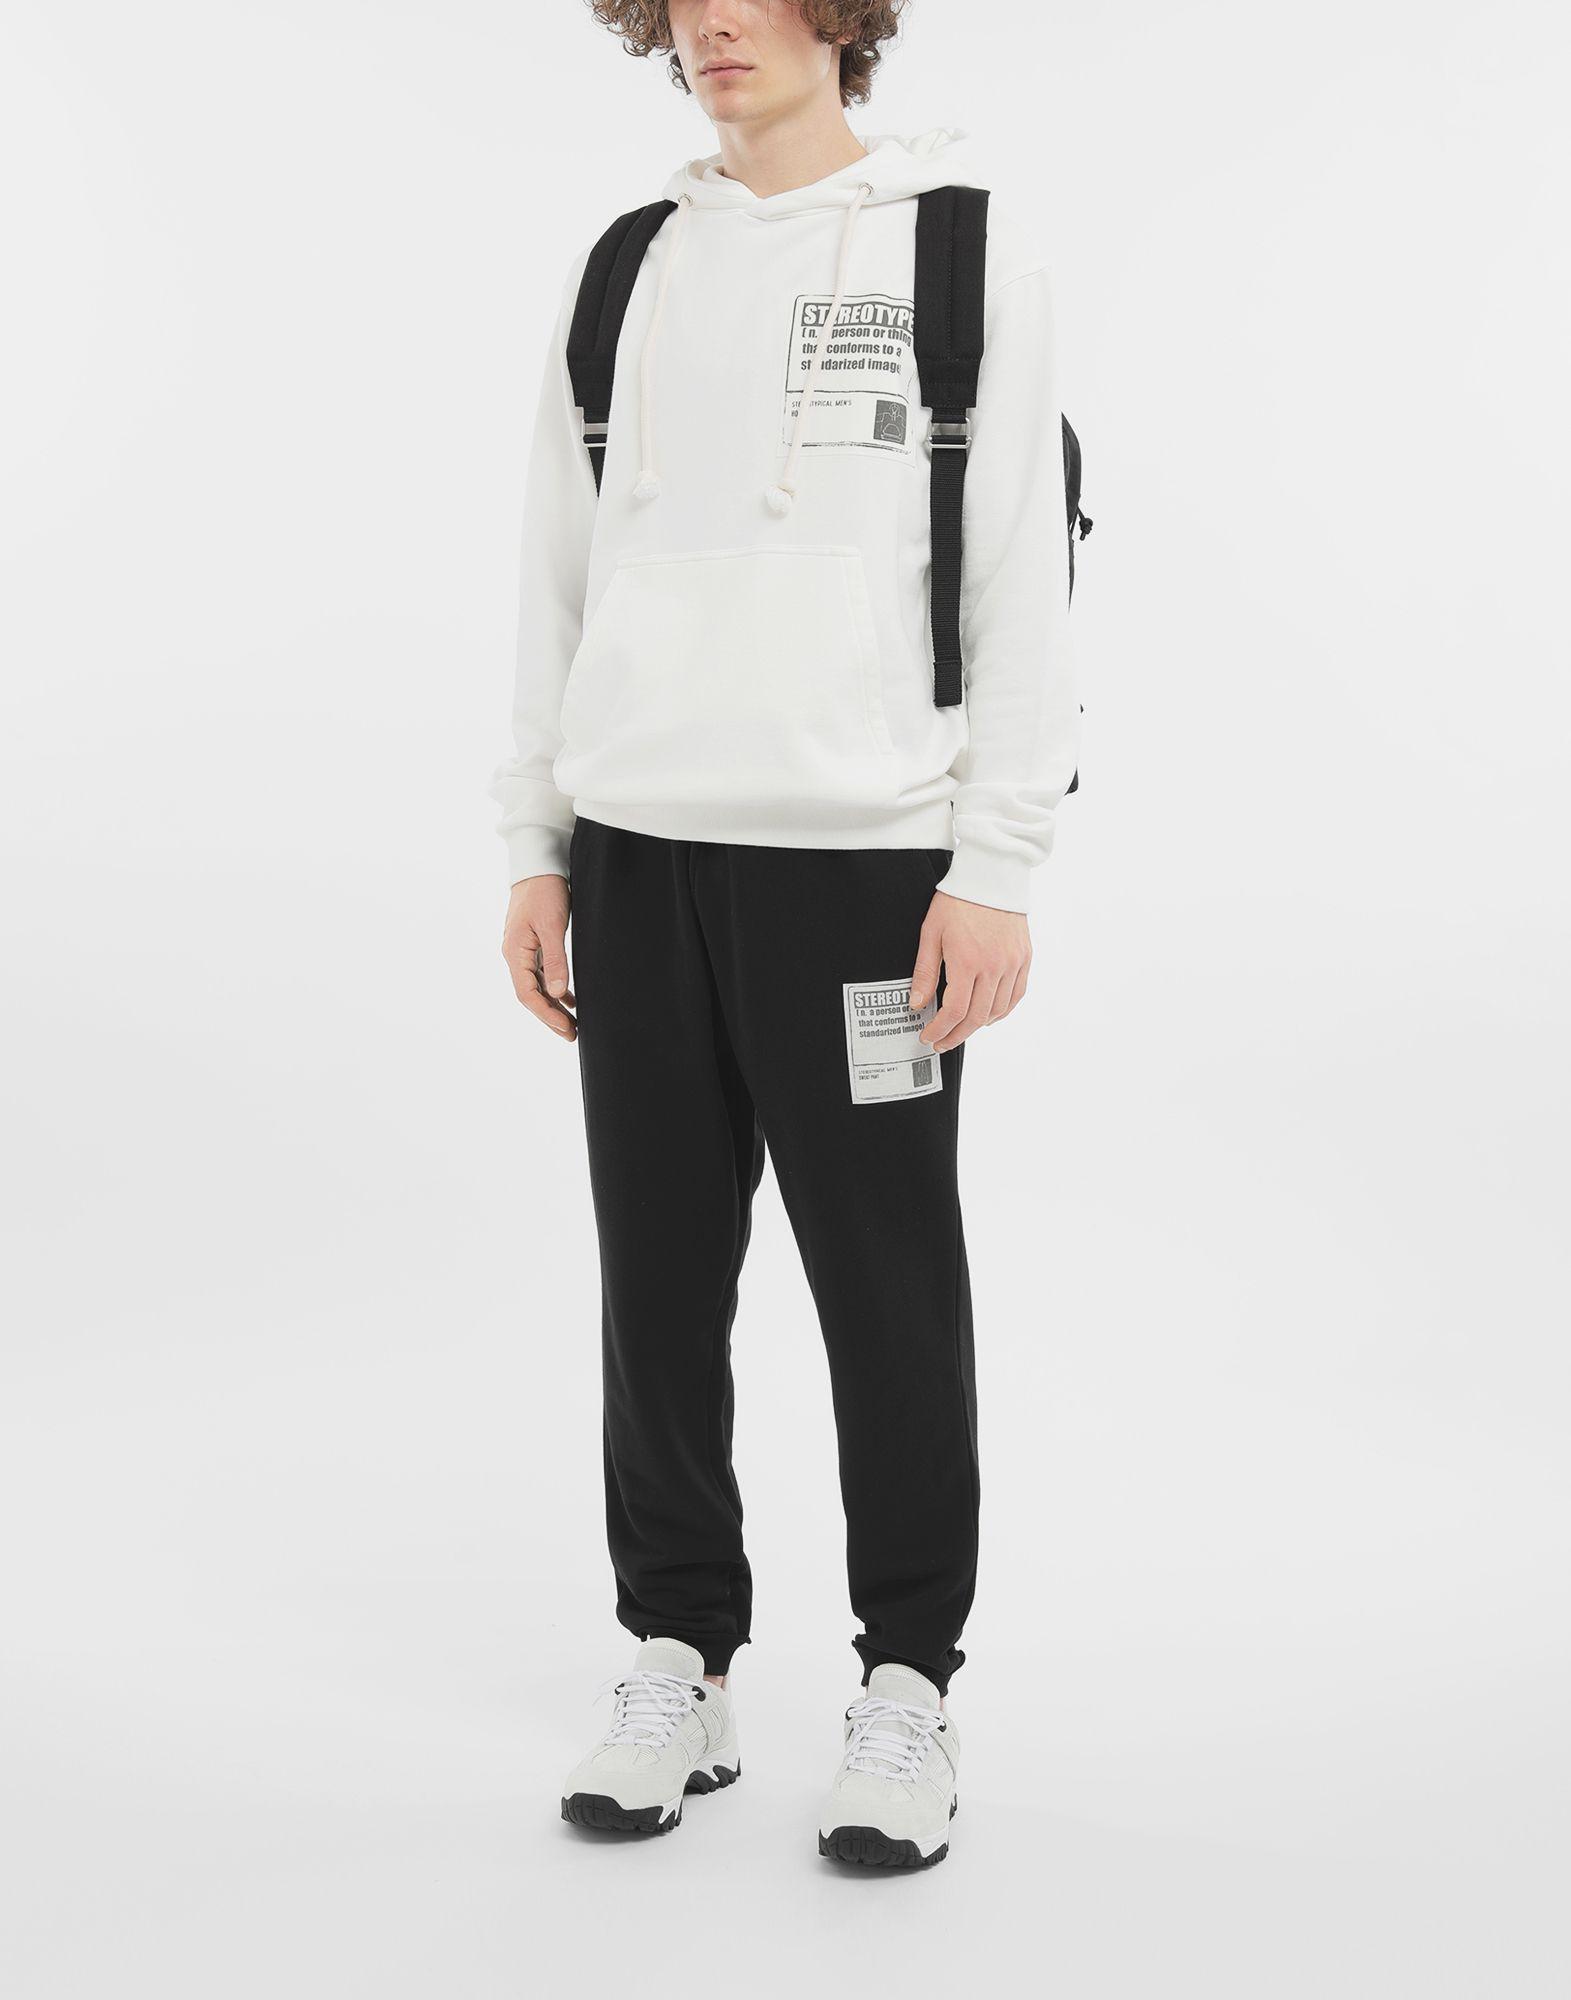 MAISON MARGIELA 'Stereotype' cotton sweatshirt Sweatshirt Man d